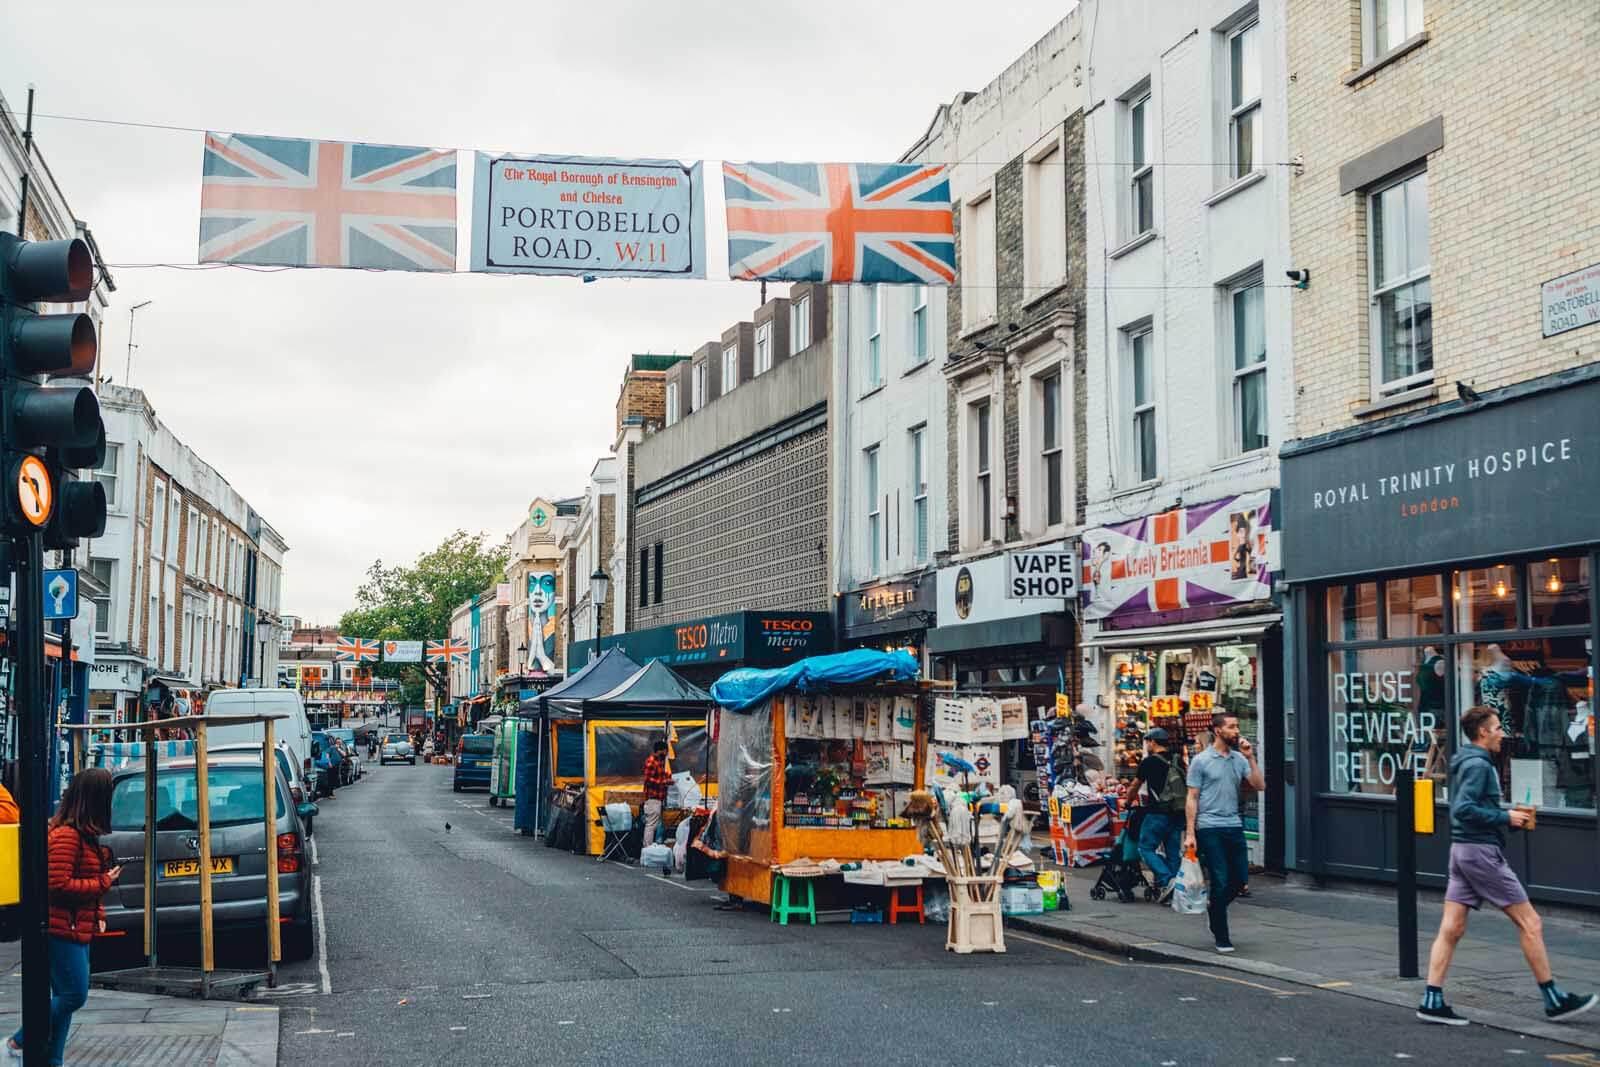 Portobello Market in Notting Hill London